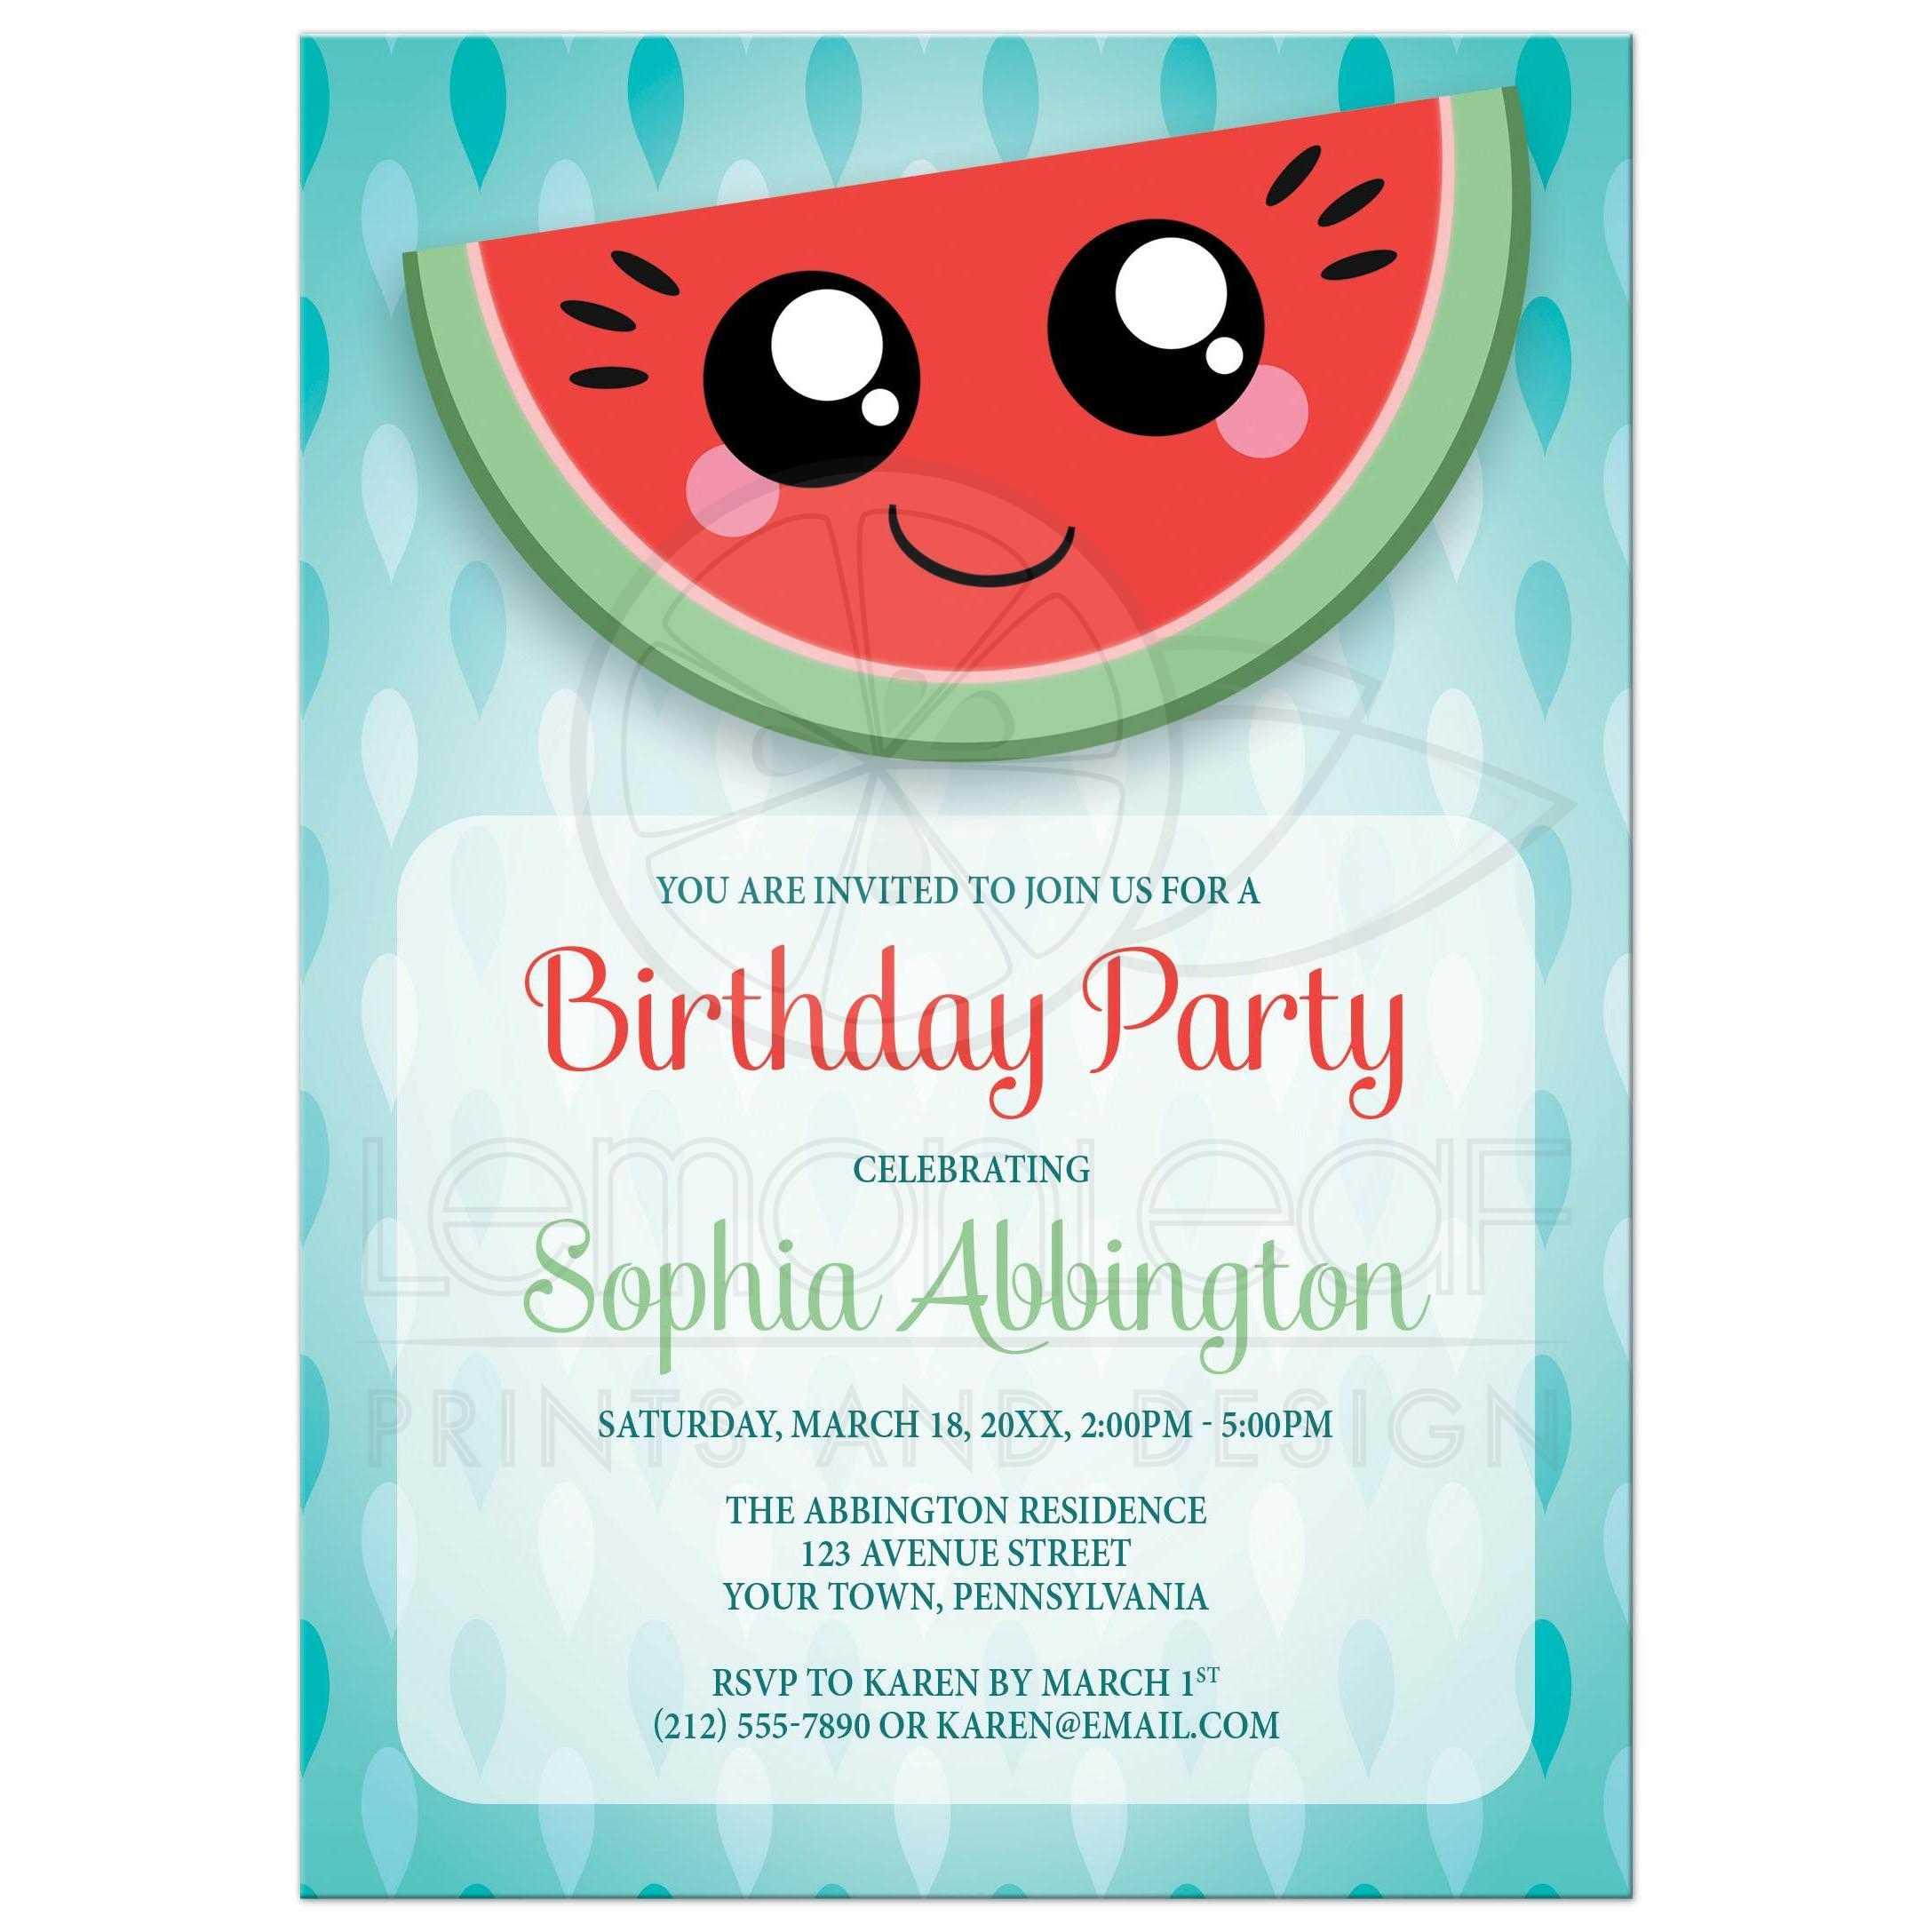 birthday party invitations happy smiling watermelon slice